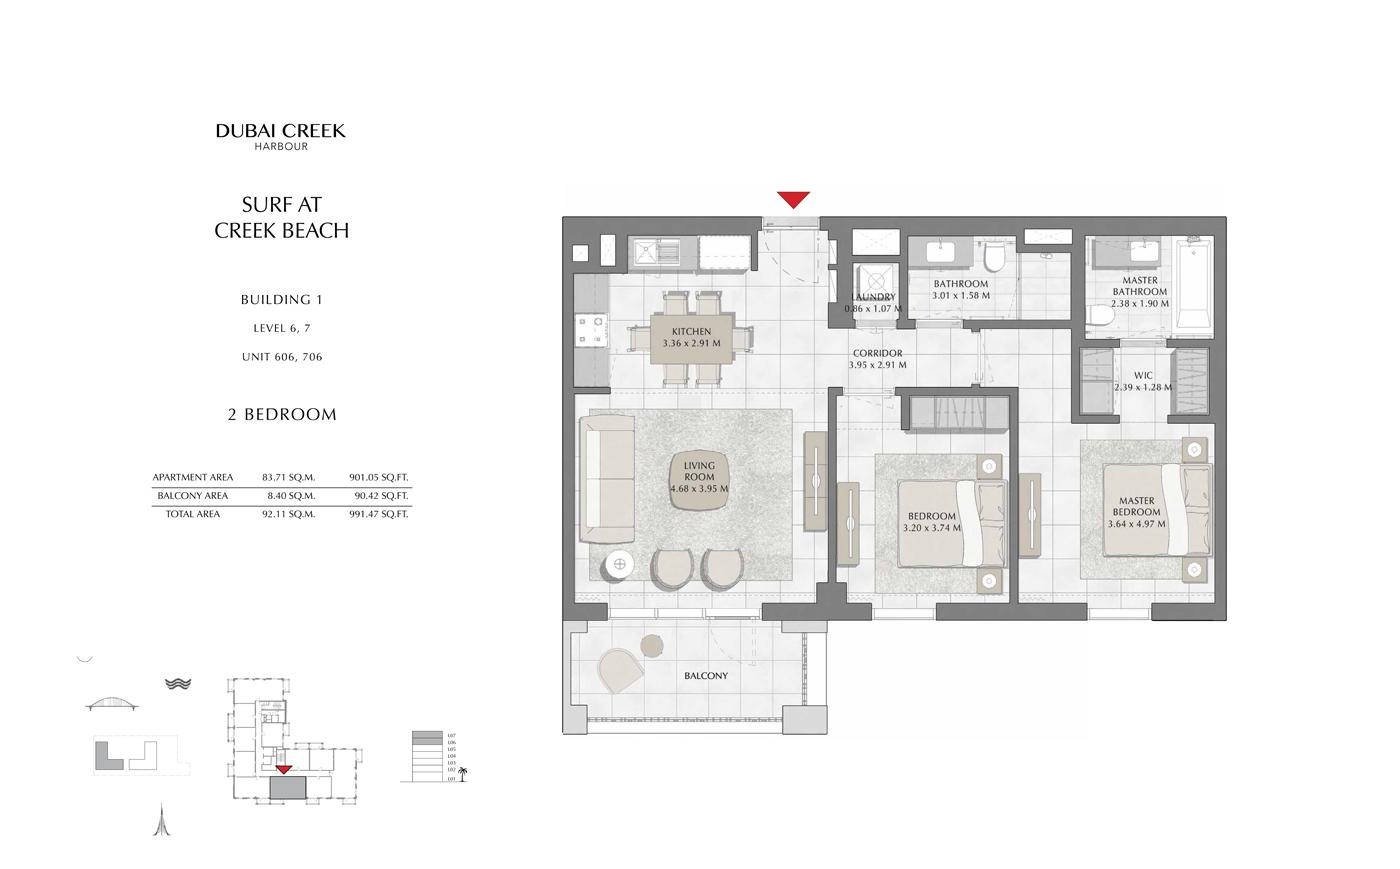 Building 1, 2 Bedroom, Level 6, 7, Size 991 Sq Ft